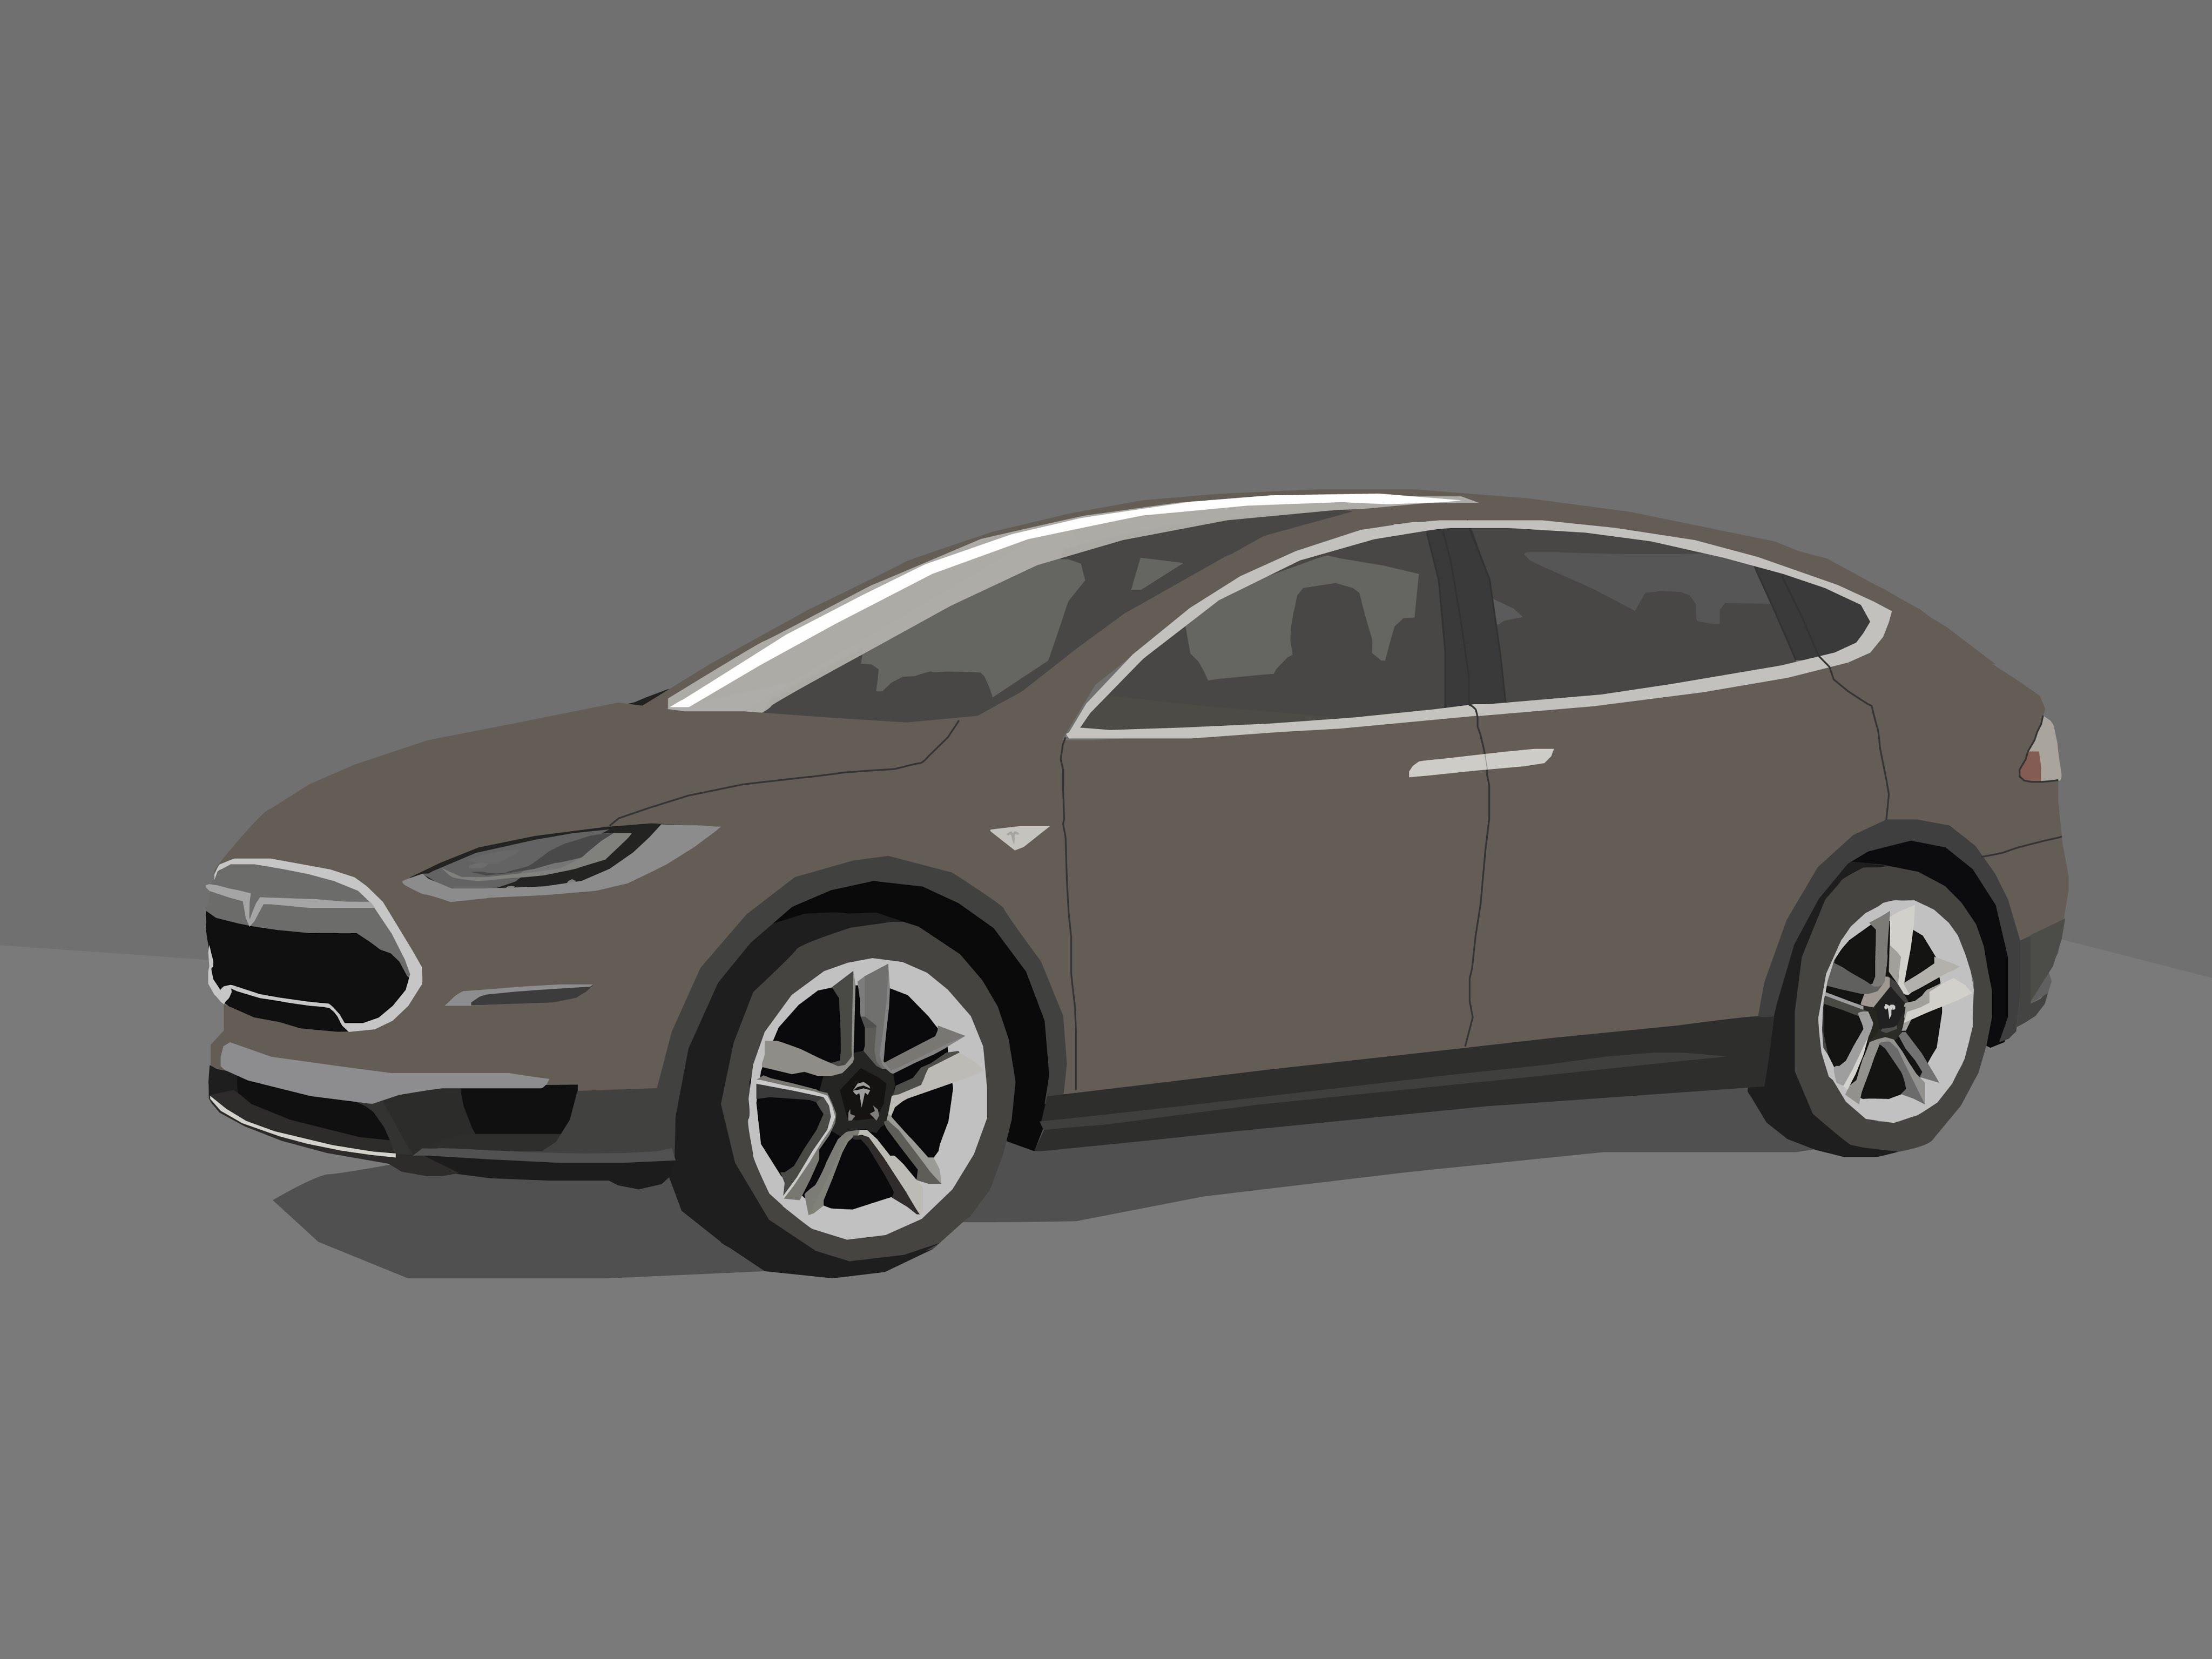 4096x3072 Tesla Model X Vector Art